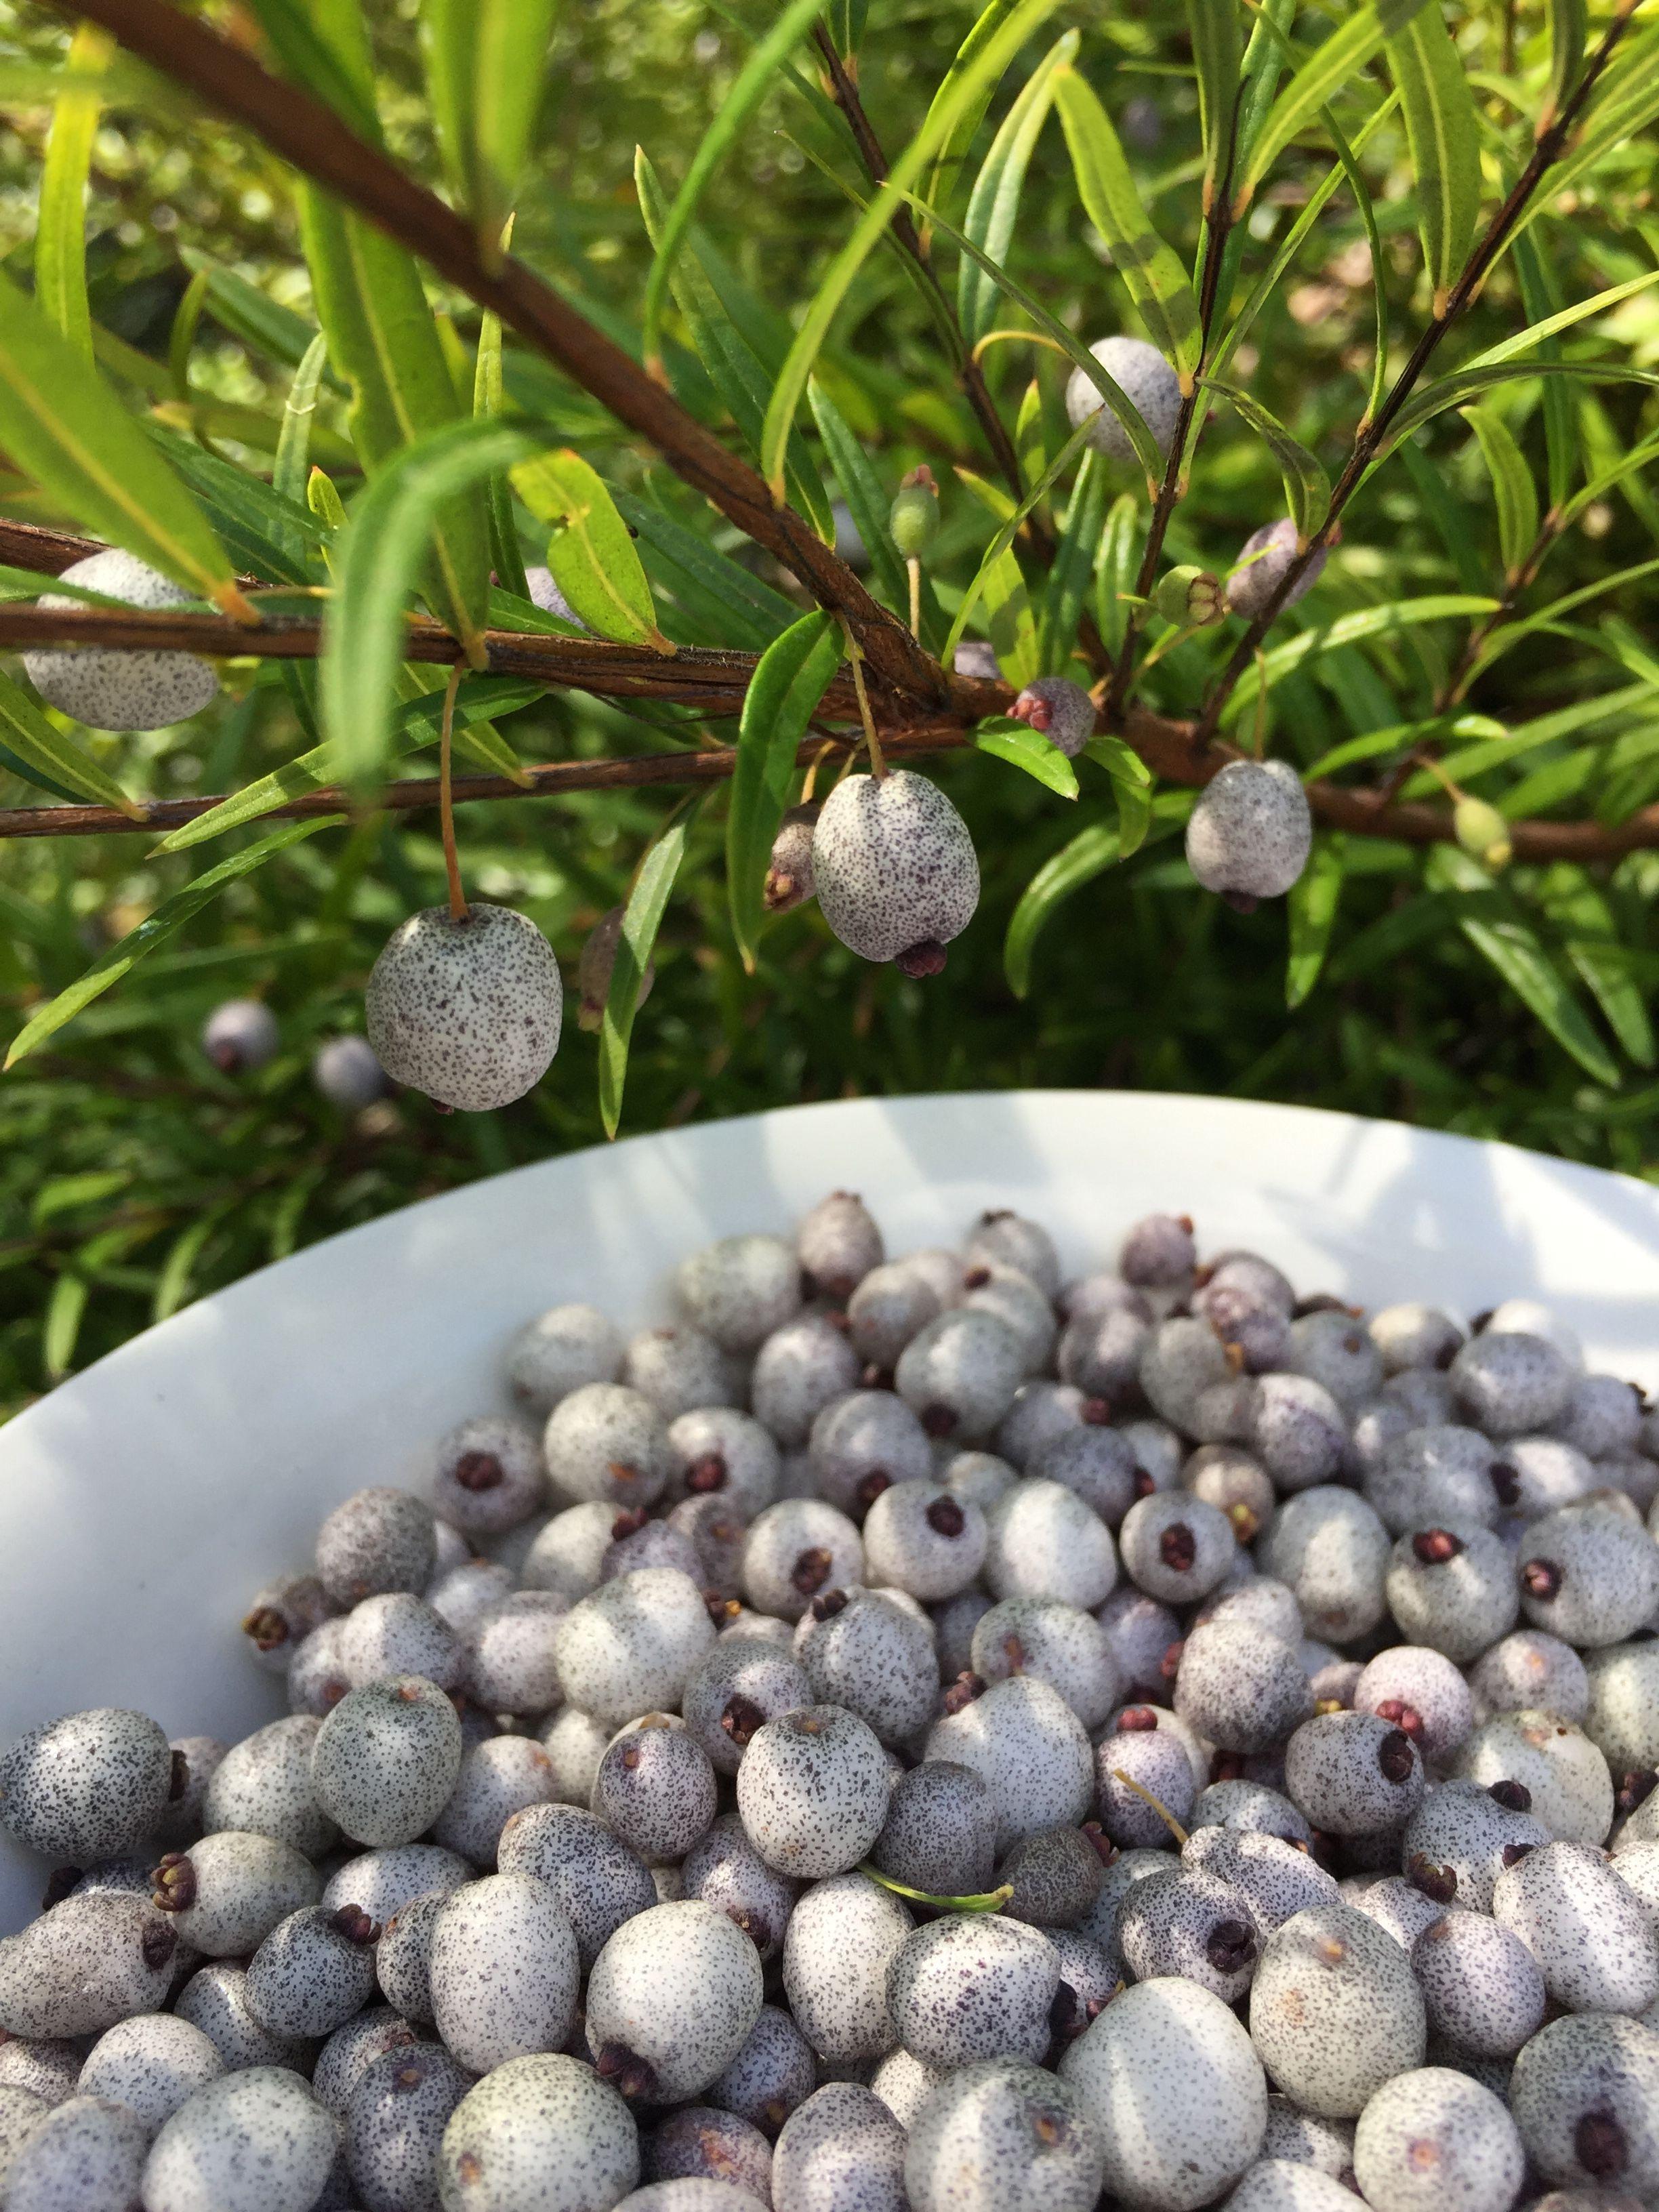 Austromyrtus Dulcis Midyim Berry A Bush Tucker Plant That Produces Masses Of Pea Sized Fruit That Can Be Eat Australian Plants Berry Plants Australian Garden